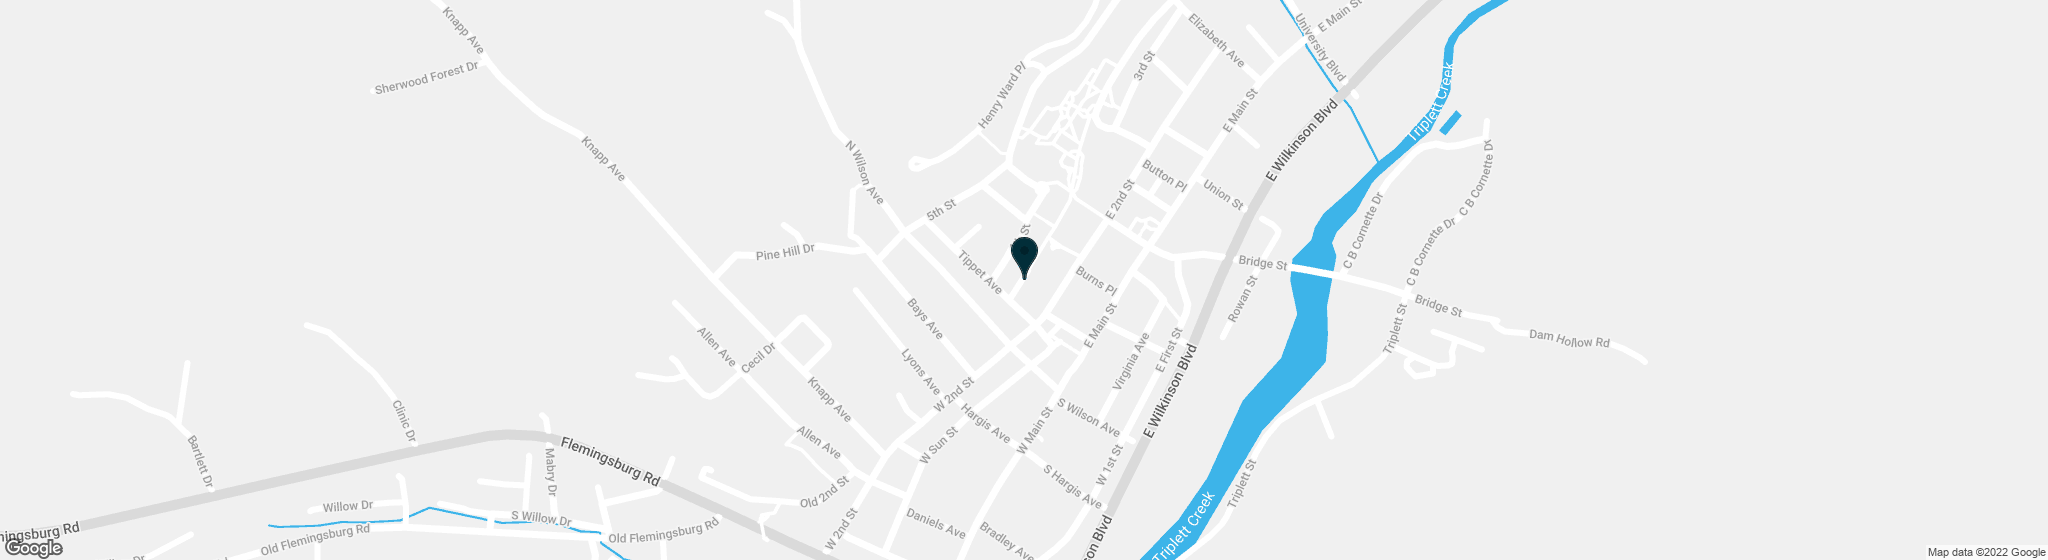 135 Second Street Morehead KY 40351